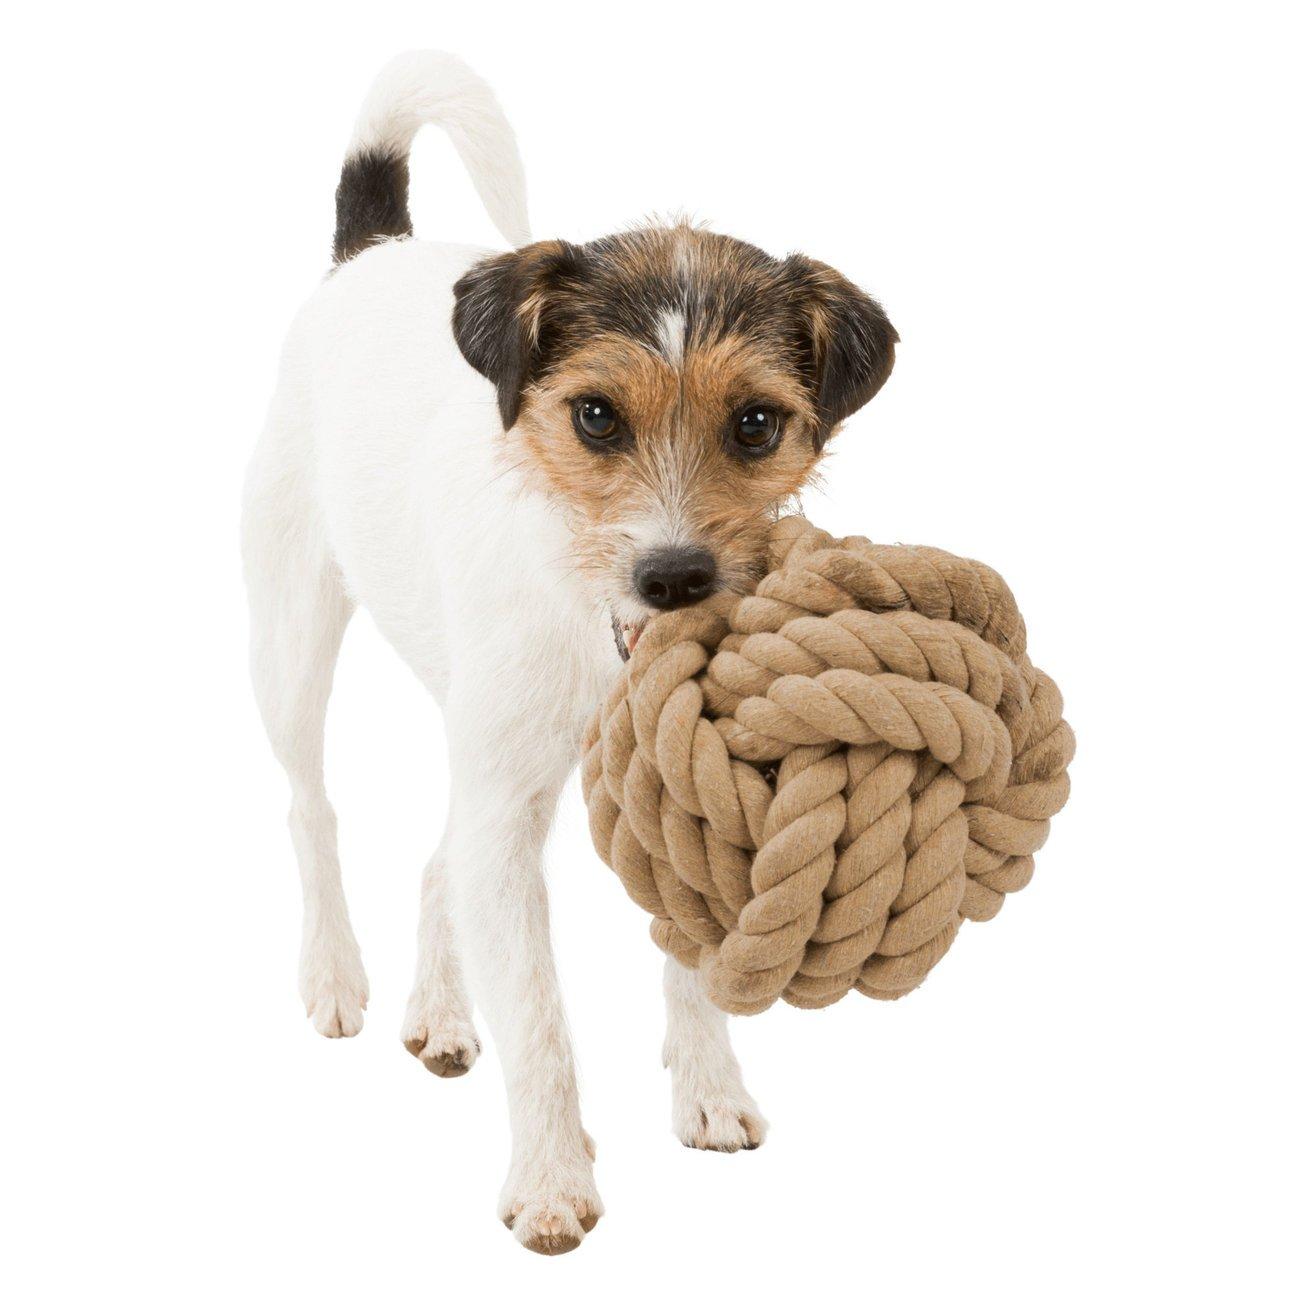 Trixie BE NORDIC Tau-Ball Hundespielzeug 32630, Bild 4